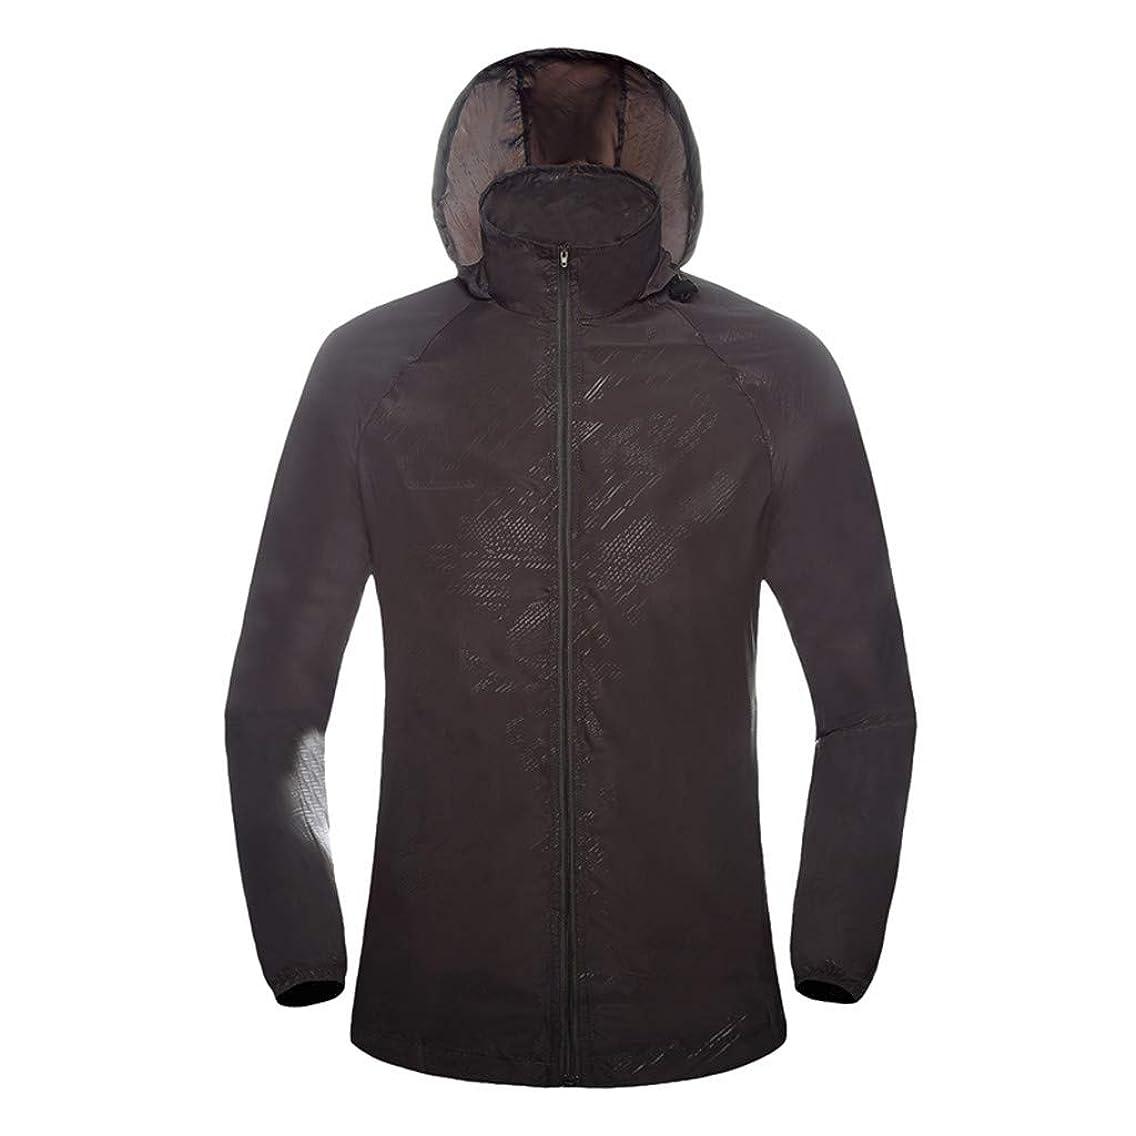 Women Mens Windproof Cycling Jackets with Hoodie Bike Reflective Rain Jacket Long Sleeve Bicycle Wind Coat